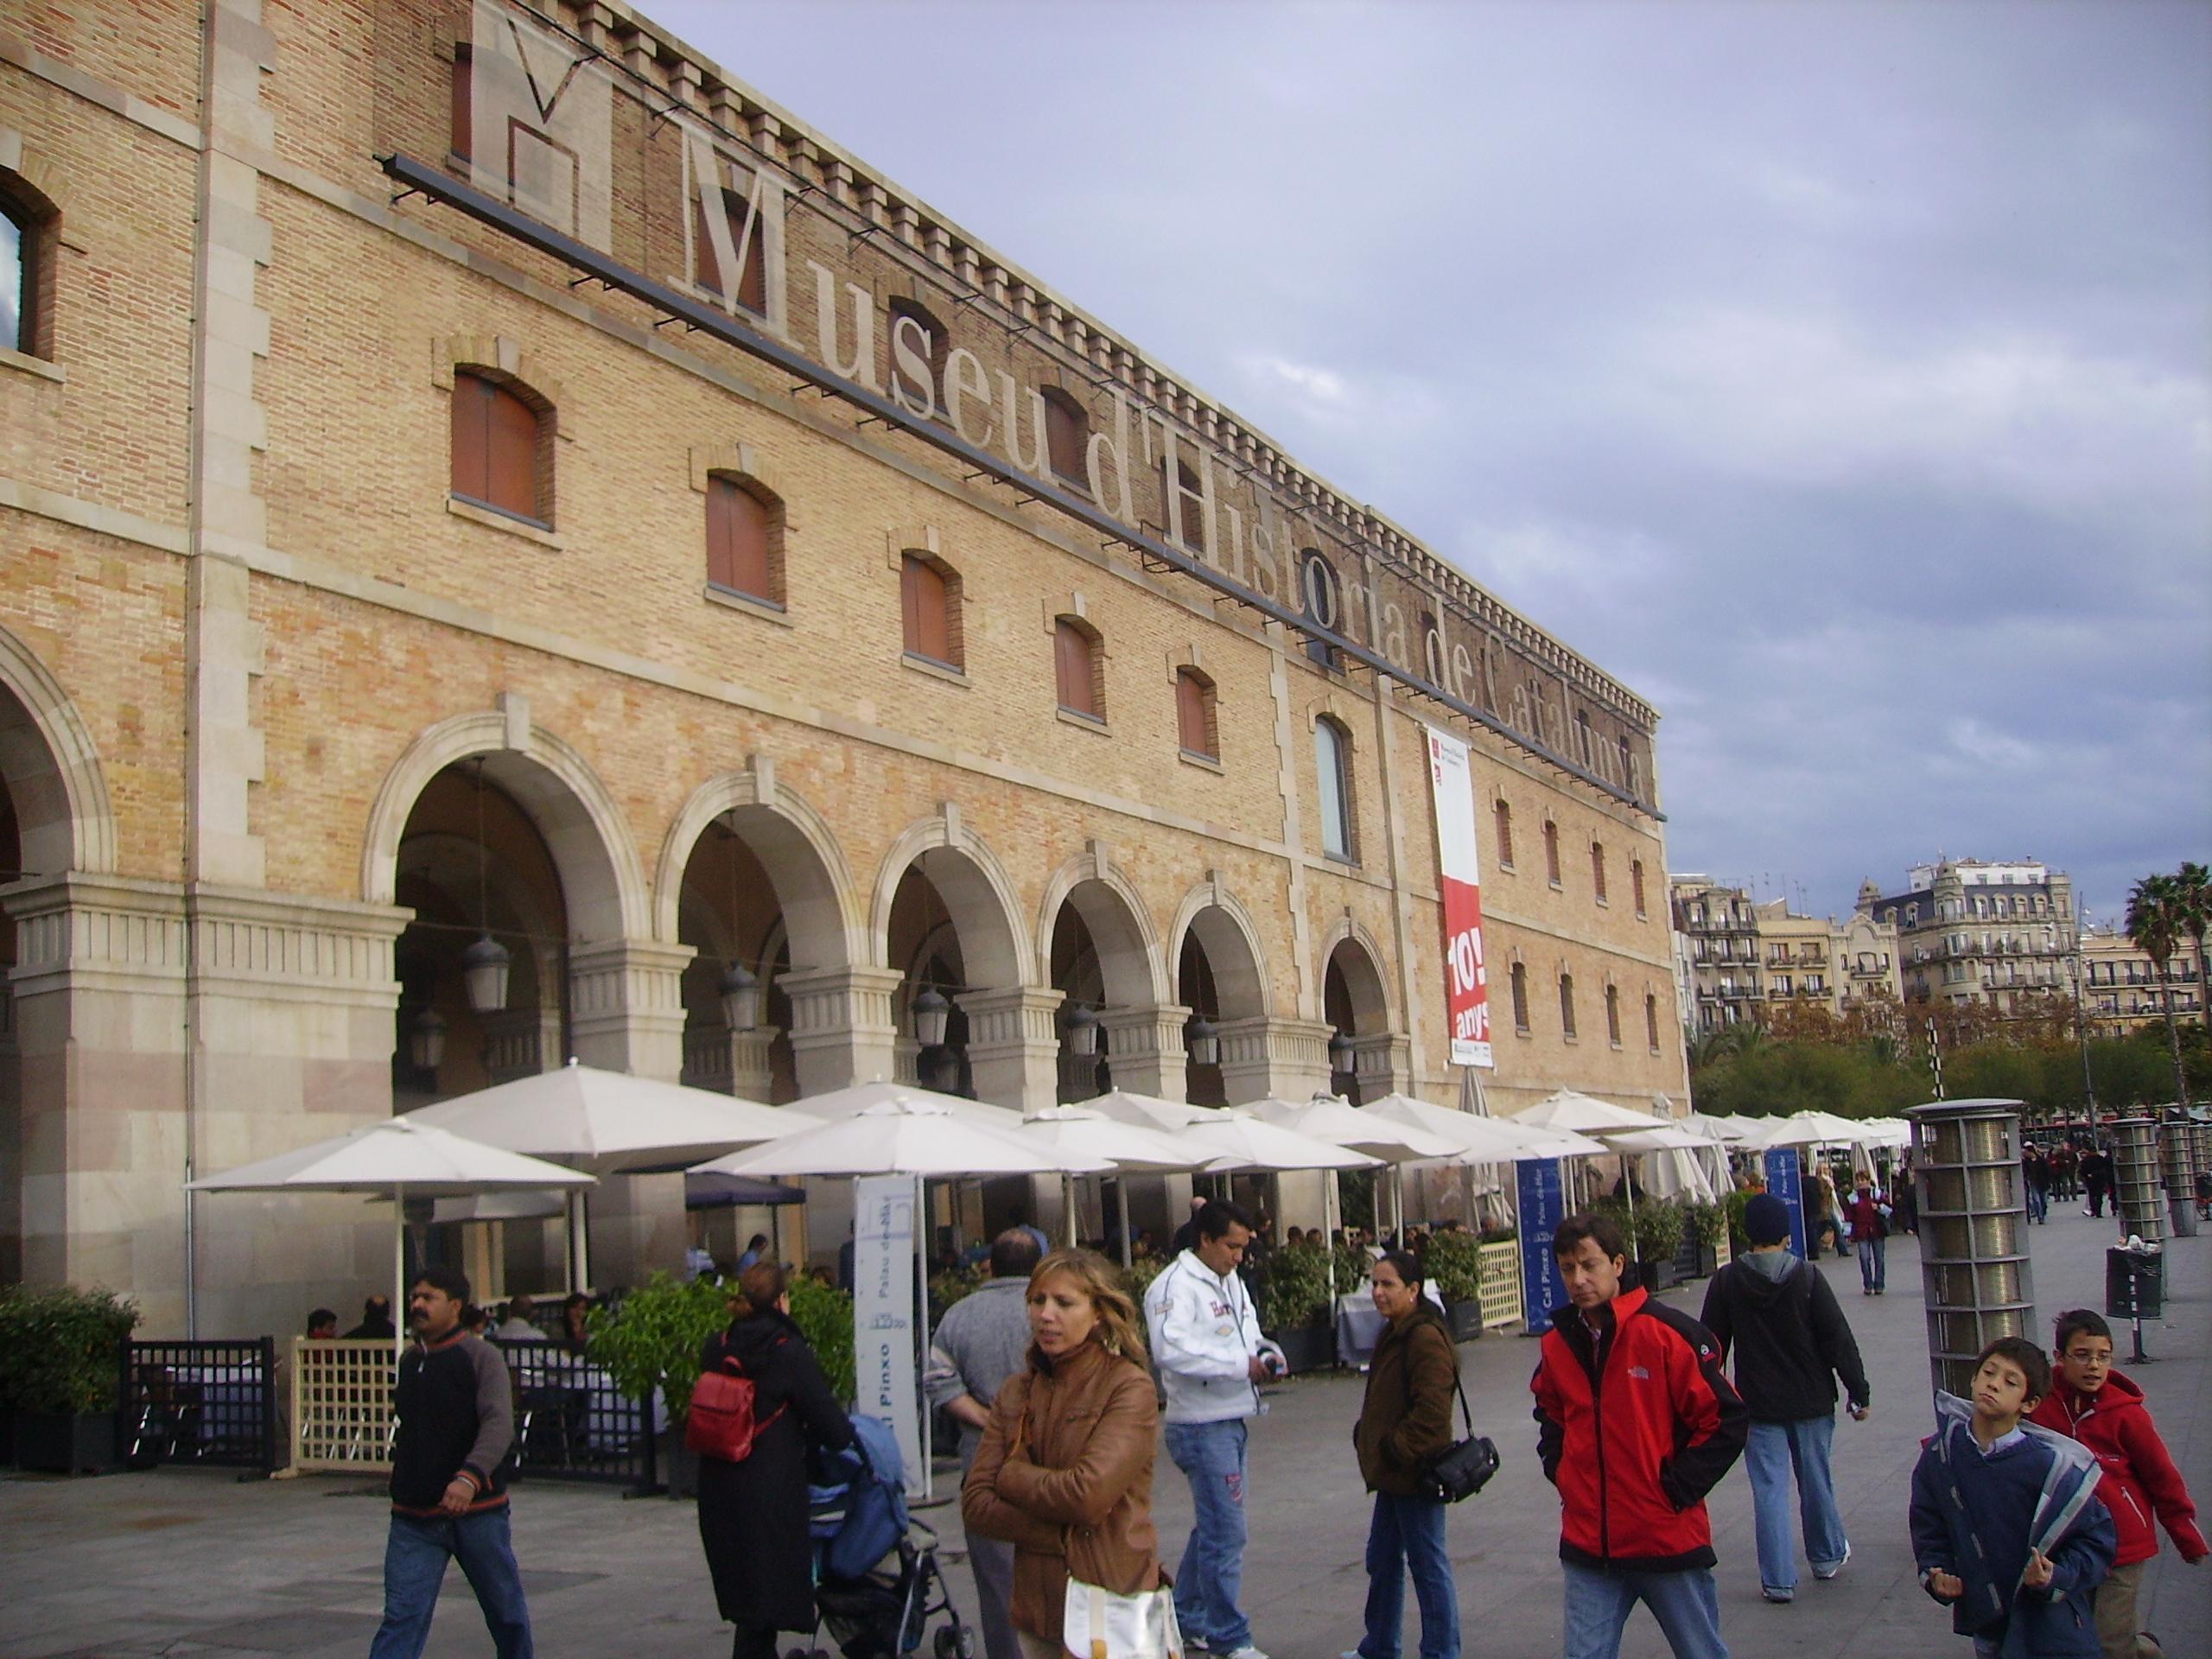 File:MHC Museu Història Catalunya Barcelona.JPG - Wikimedia Commons